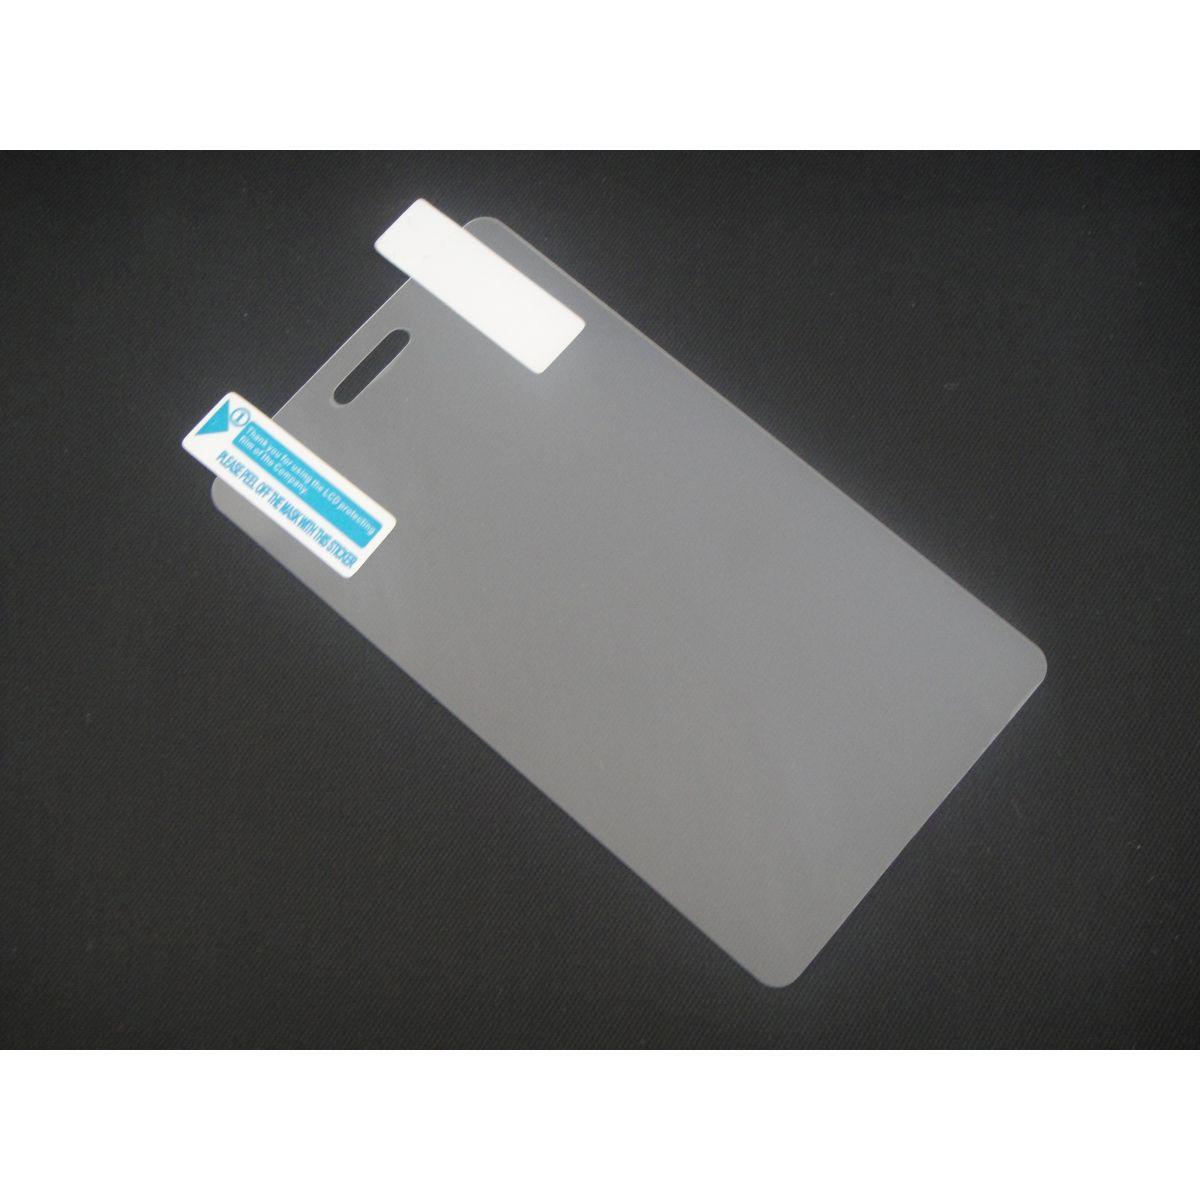 Pelicula Protetora para LG T375 Cookie Smart